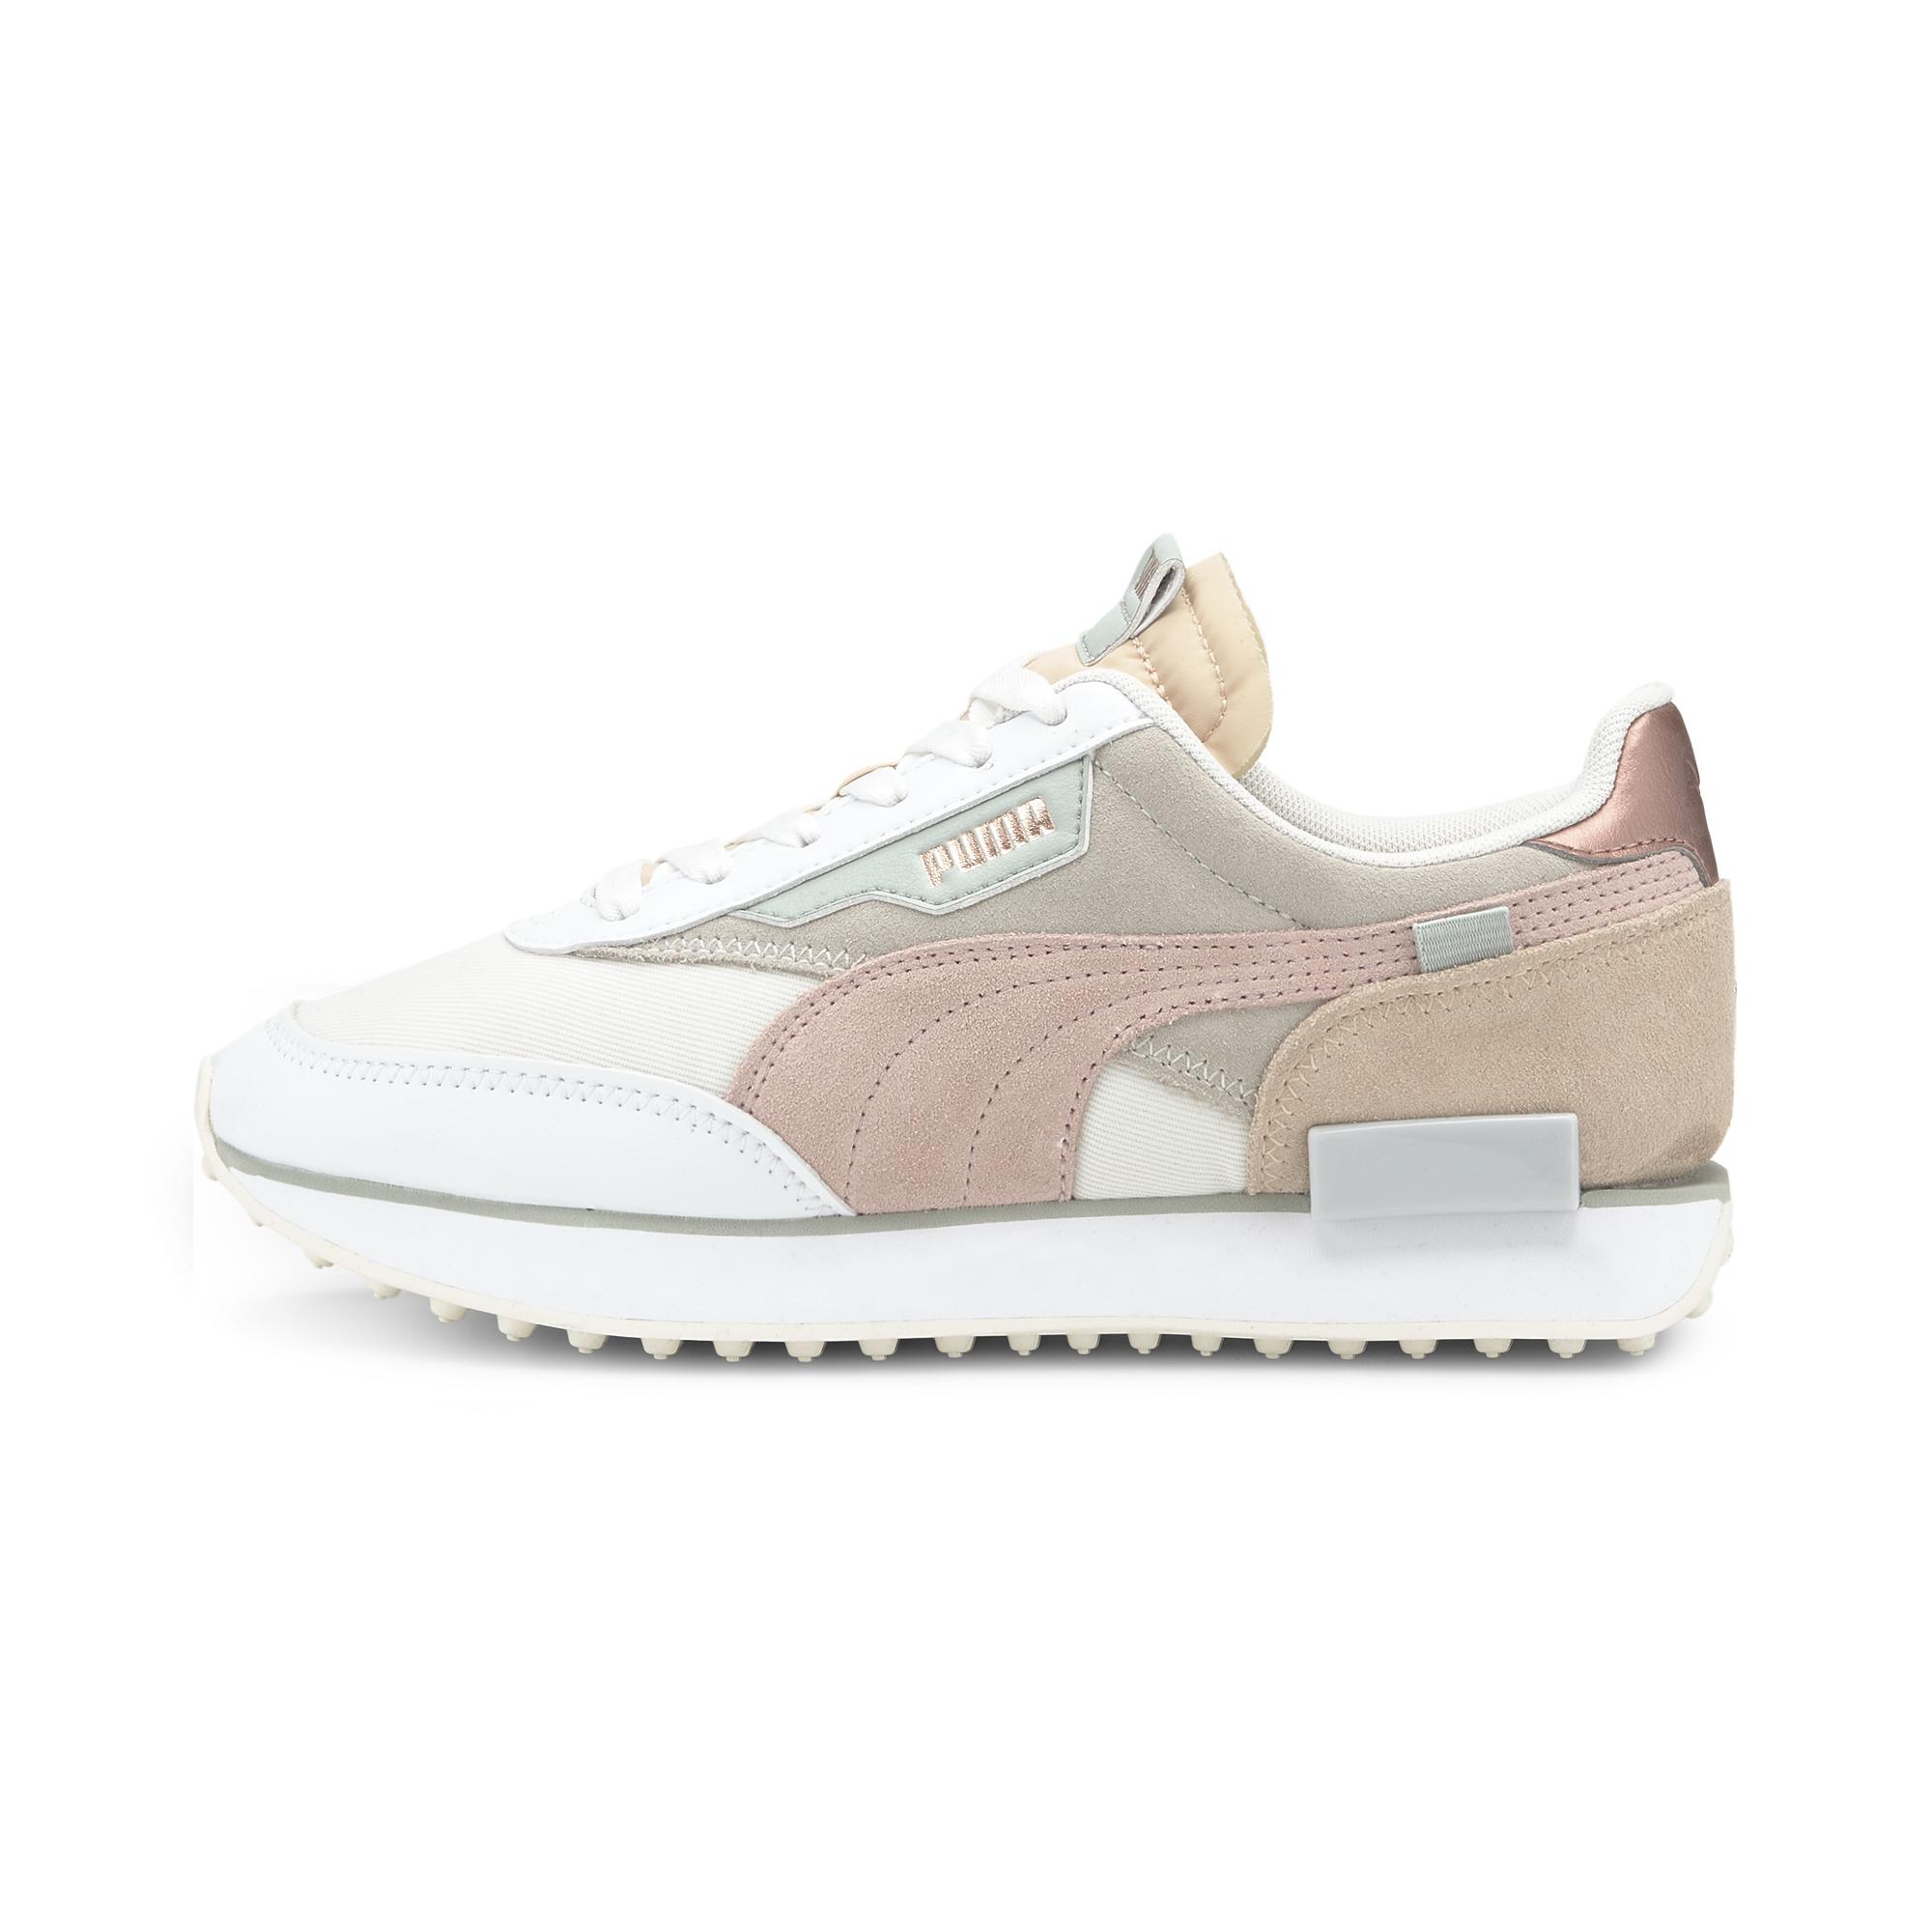 Women's shoes Puma Future Rider Soft Metal Wn s Marshmallow-Natural Vachetta